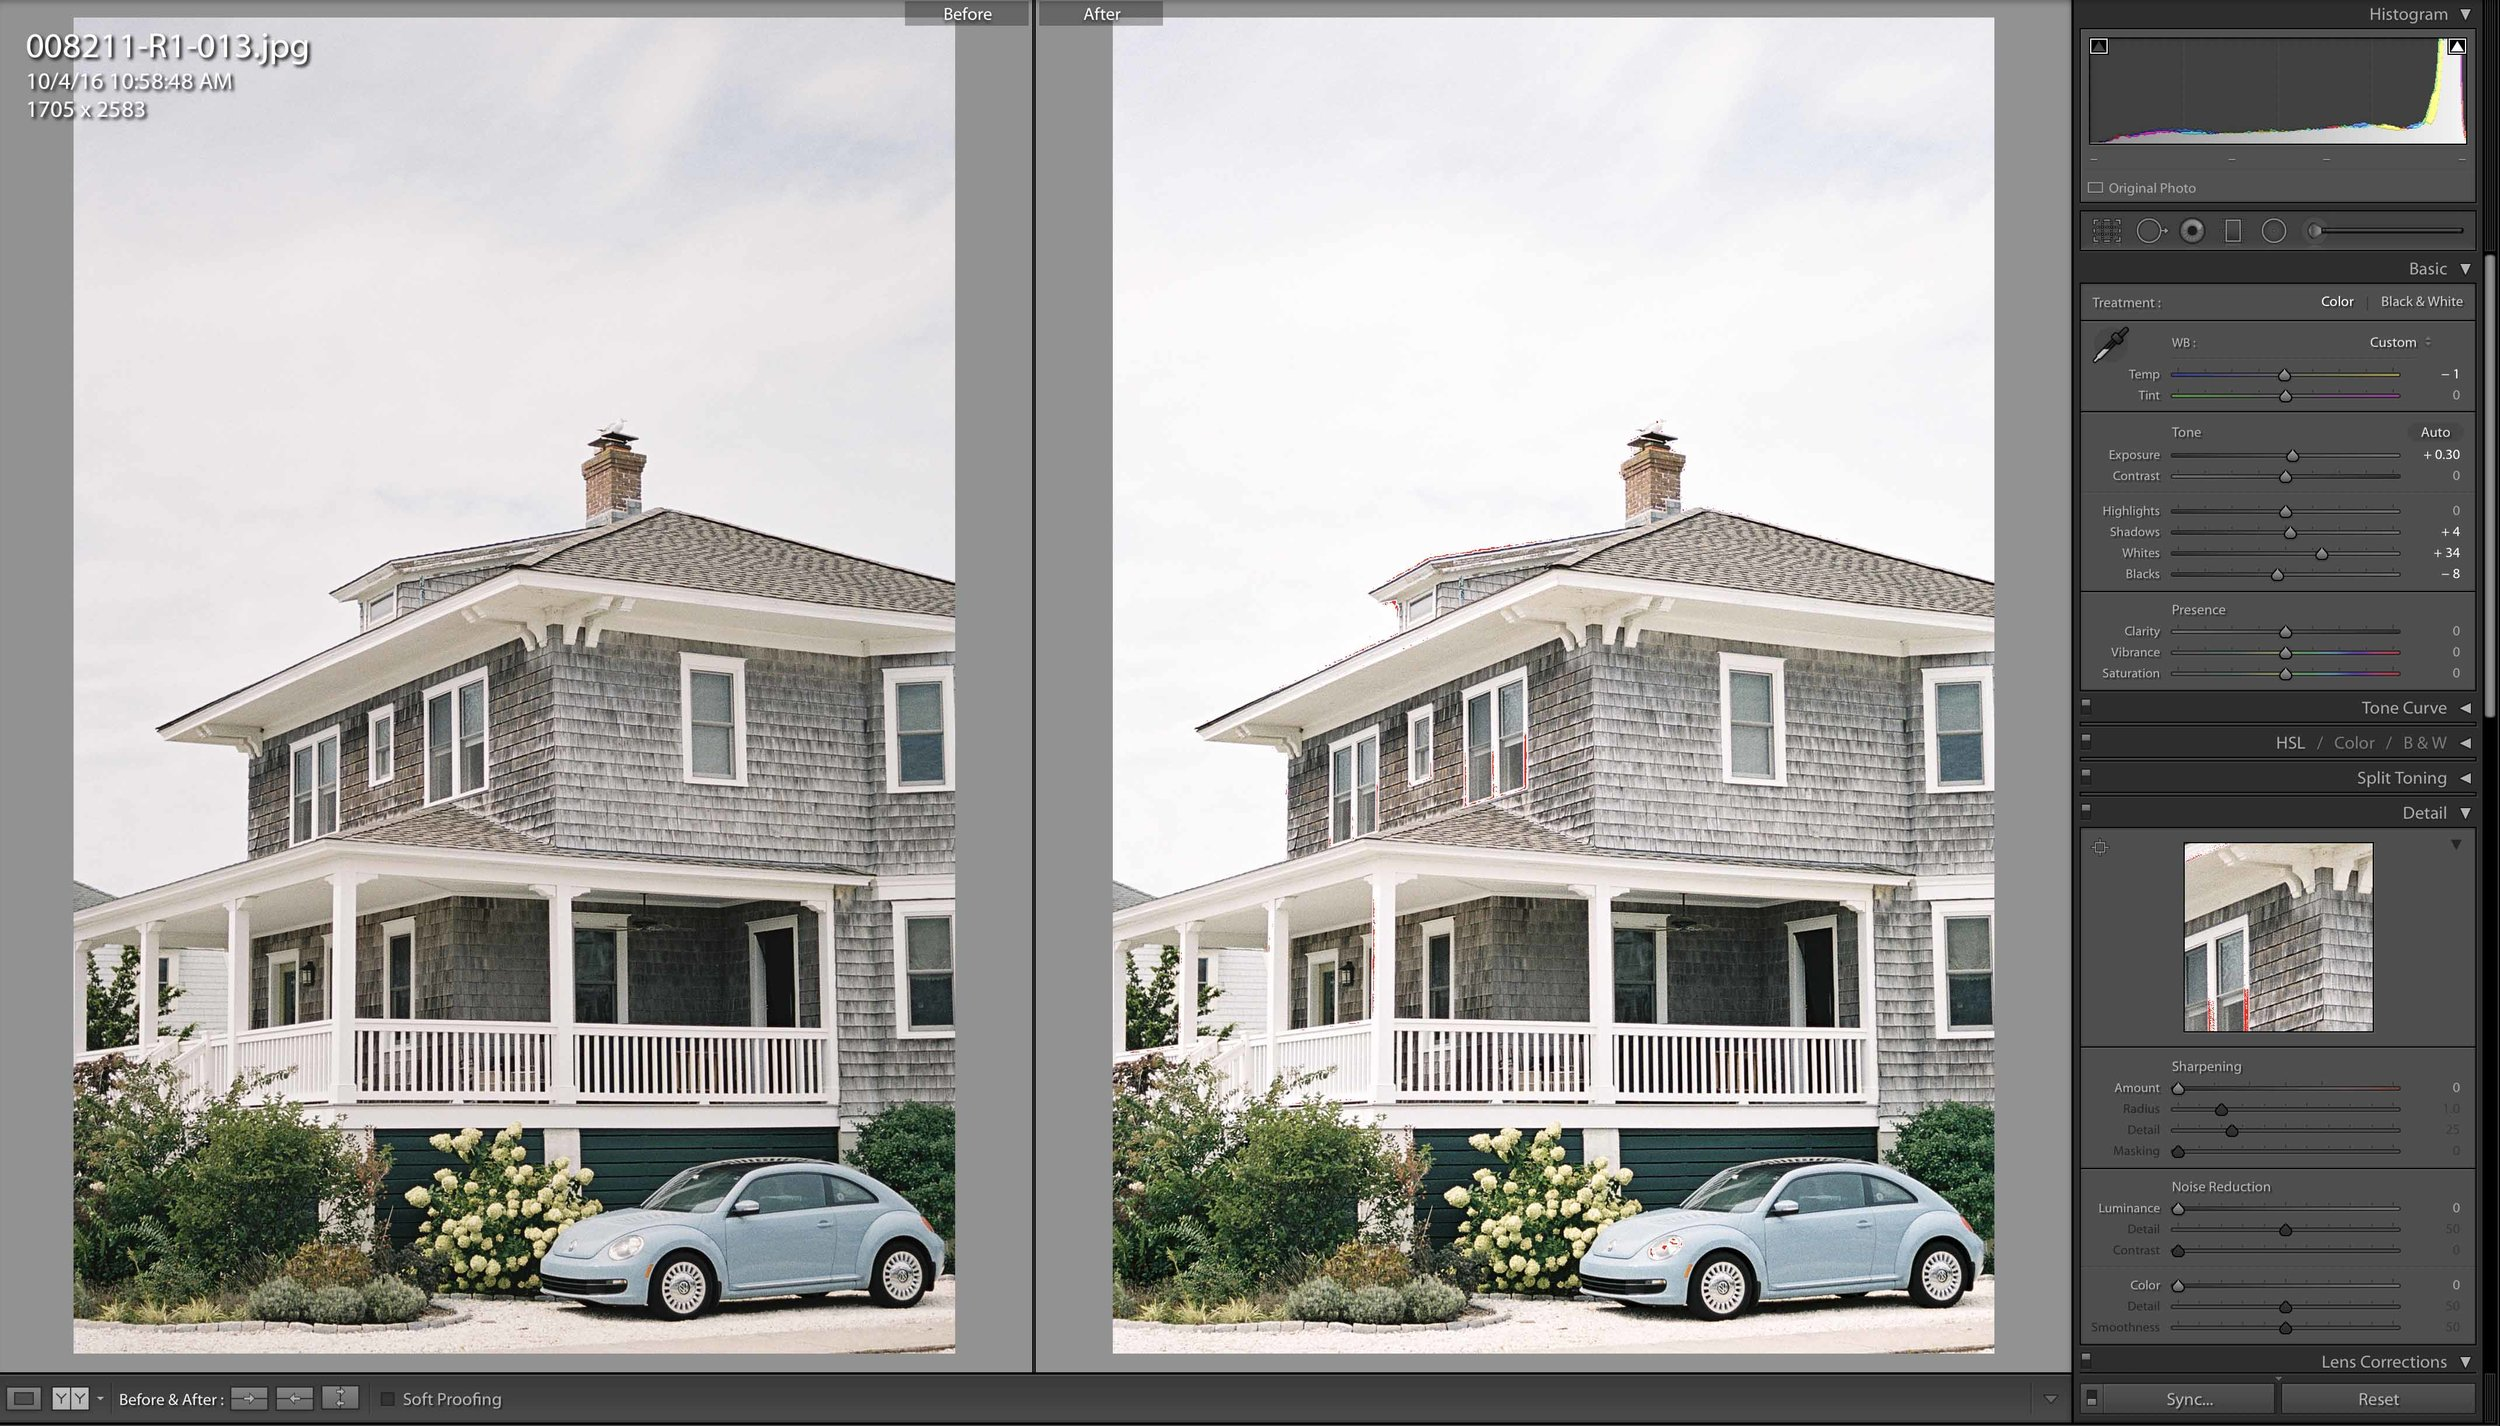 Leica M6, Summicron-M 50mm f/2, Kodak Portra 400, Rated @ 200